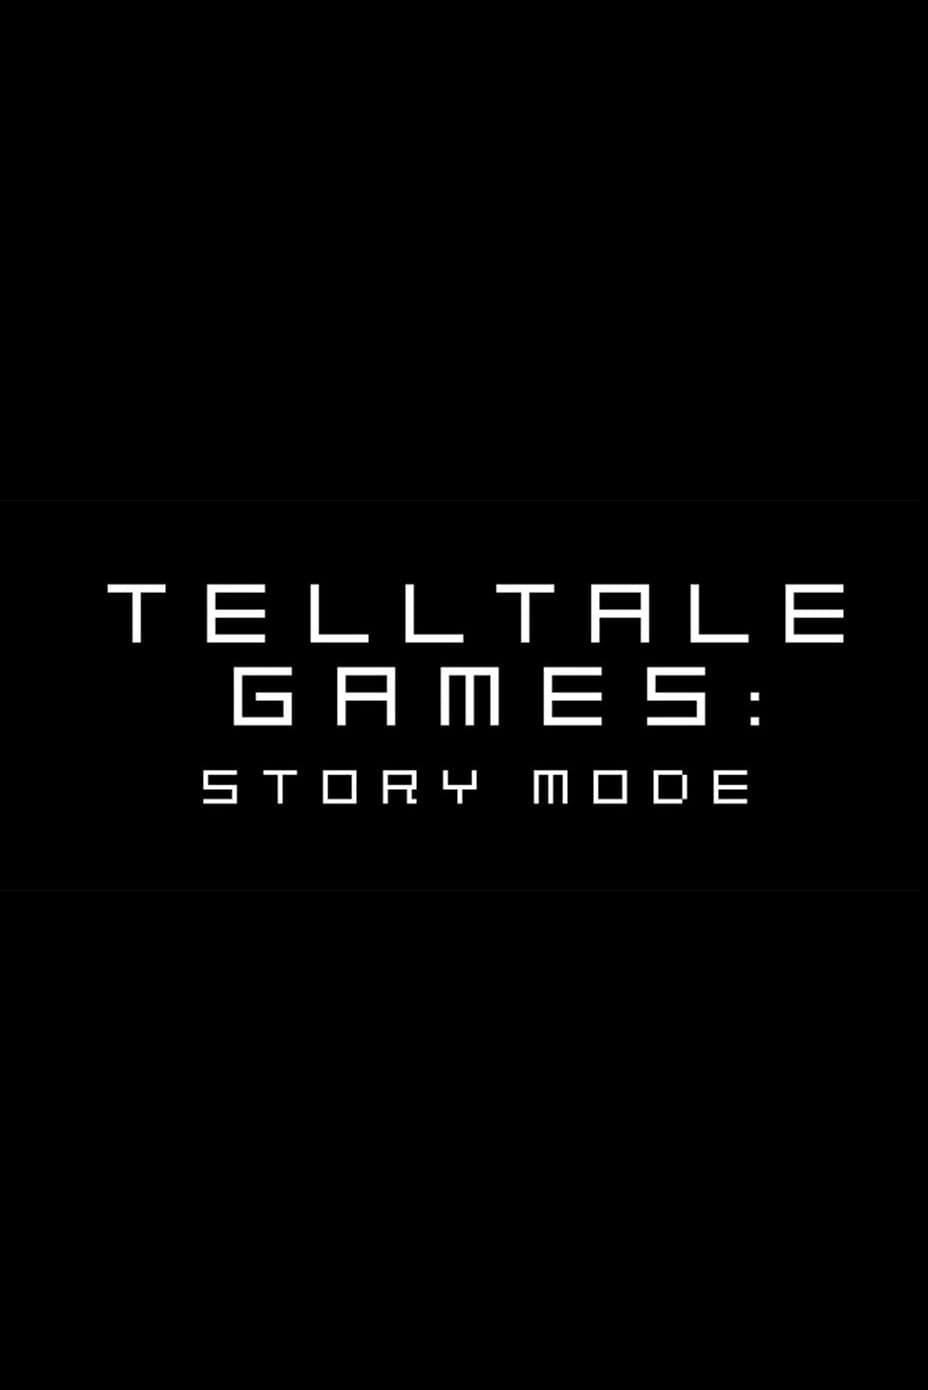 Telltale Games: Story Mode